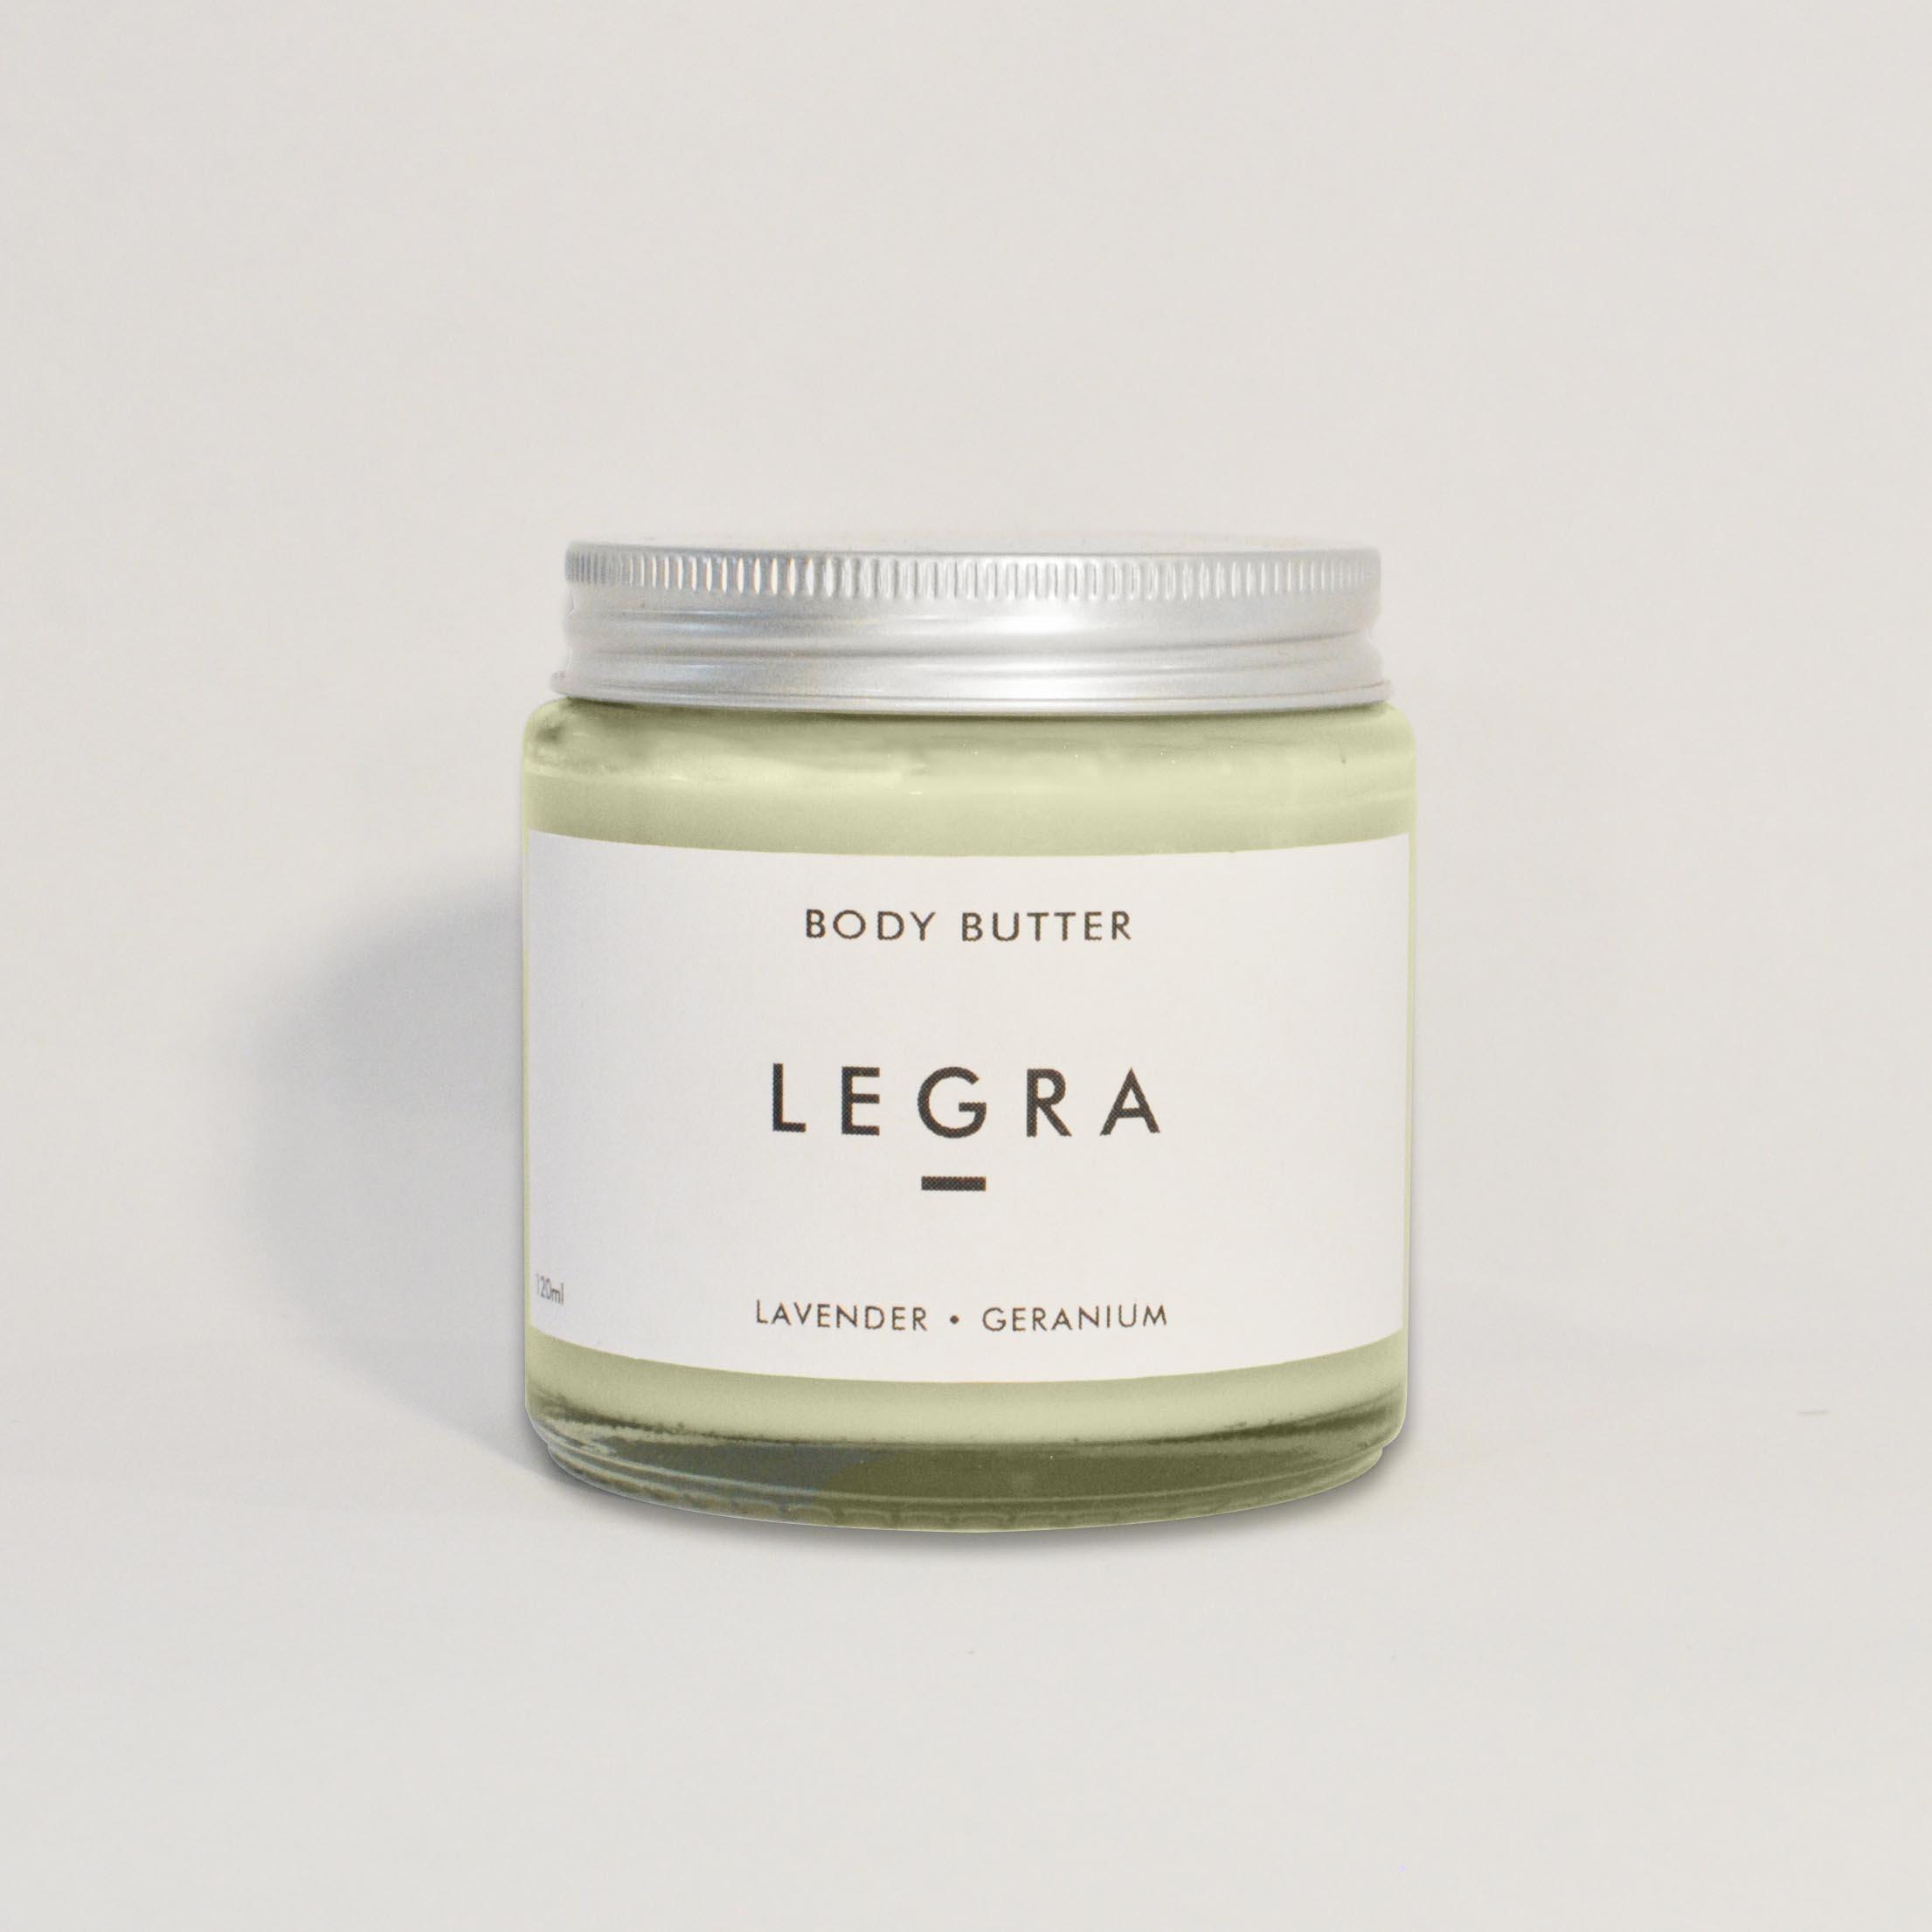 Body Butter with Lavender, Geranium & Patchouli (120ml)